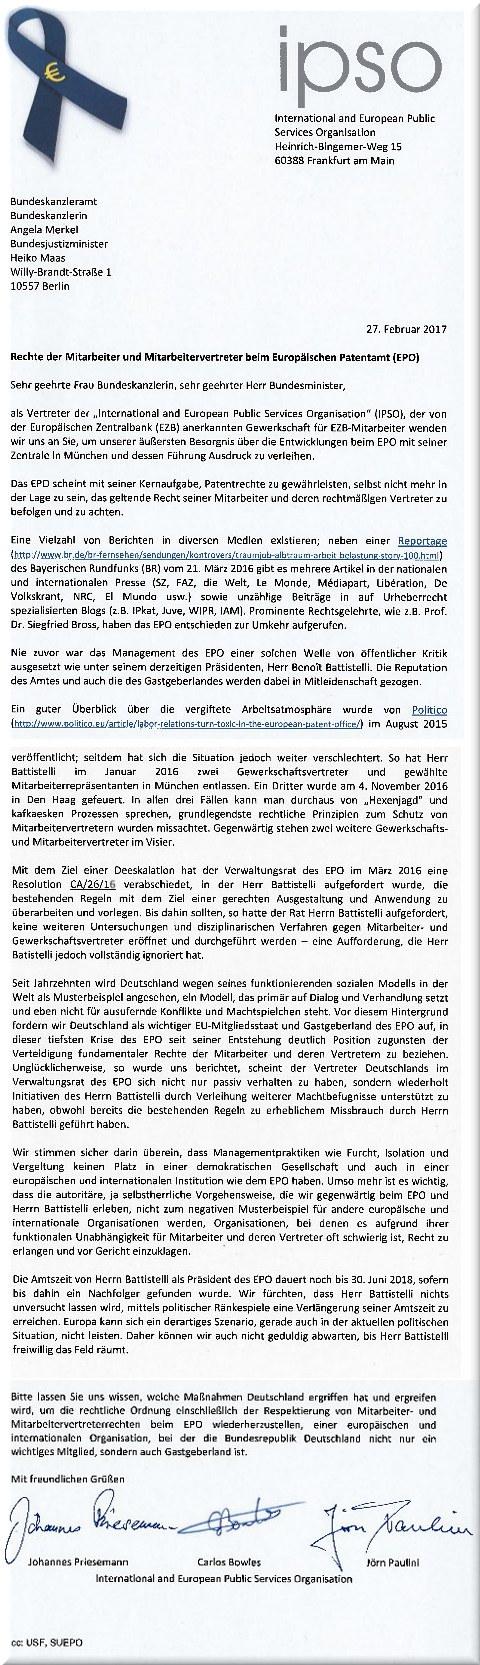 IPSO letter to Angela Merkel